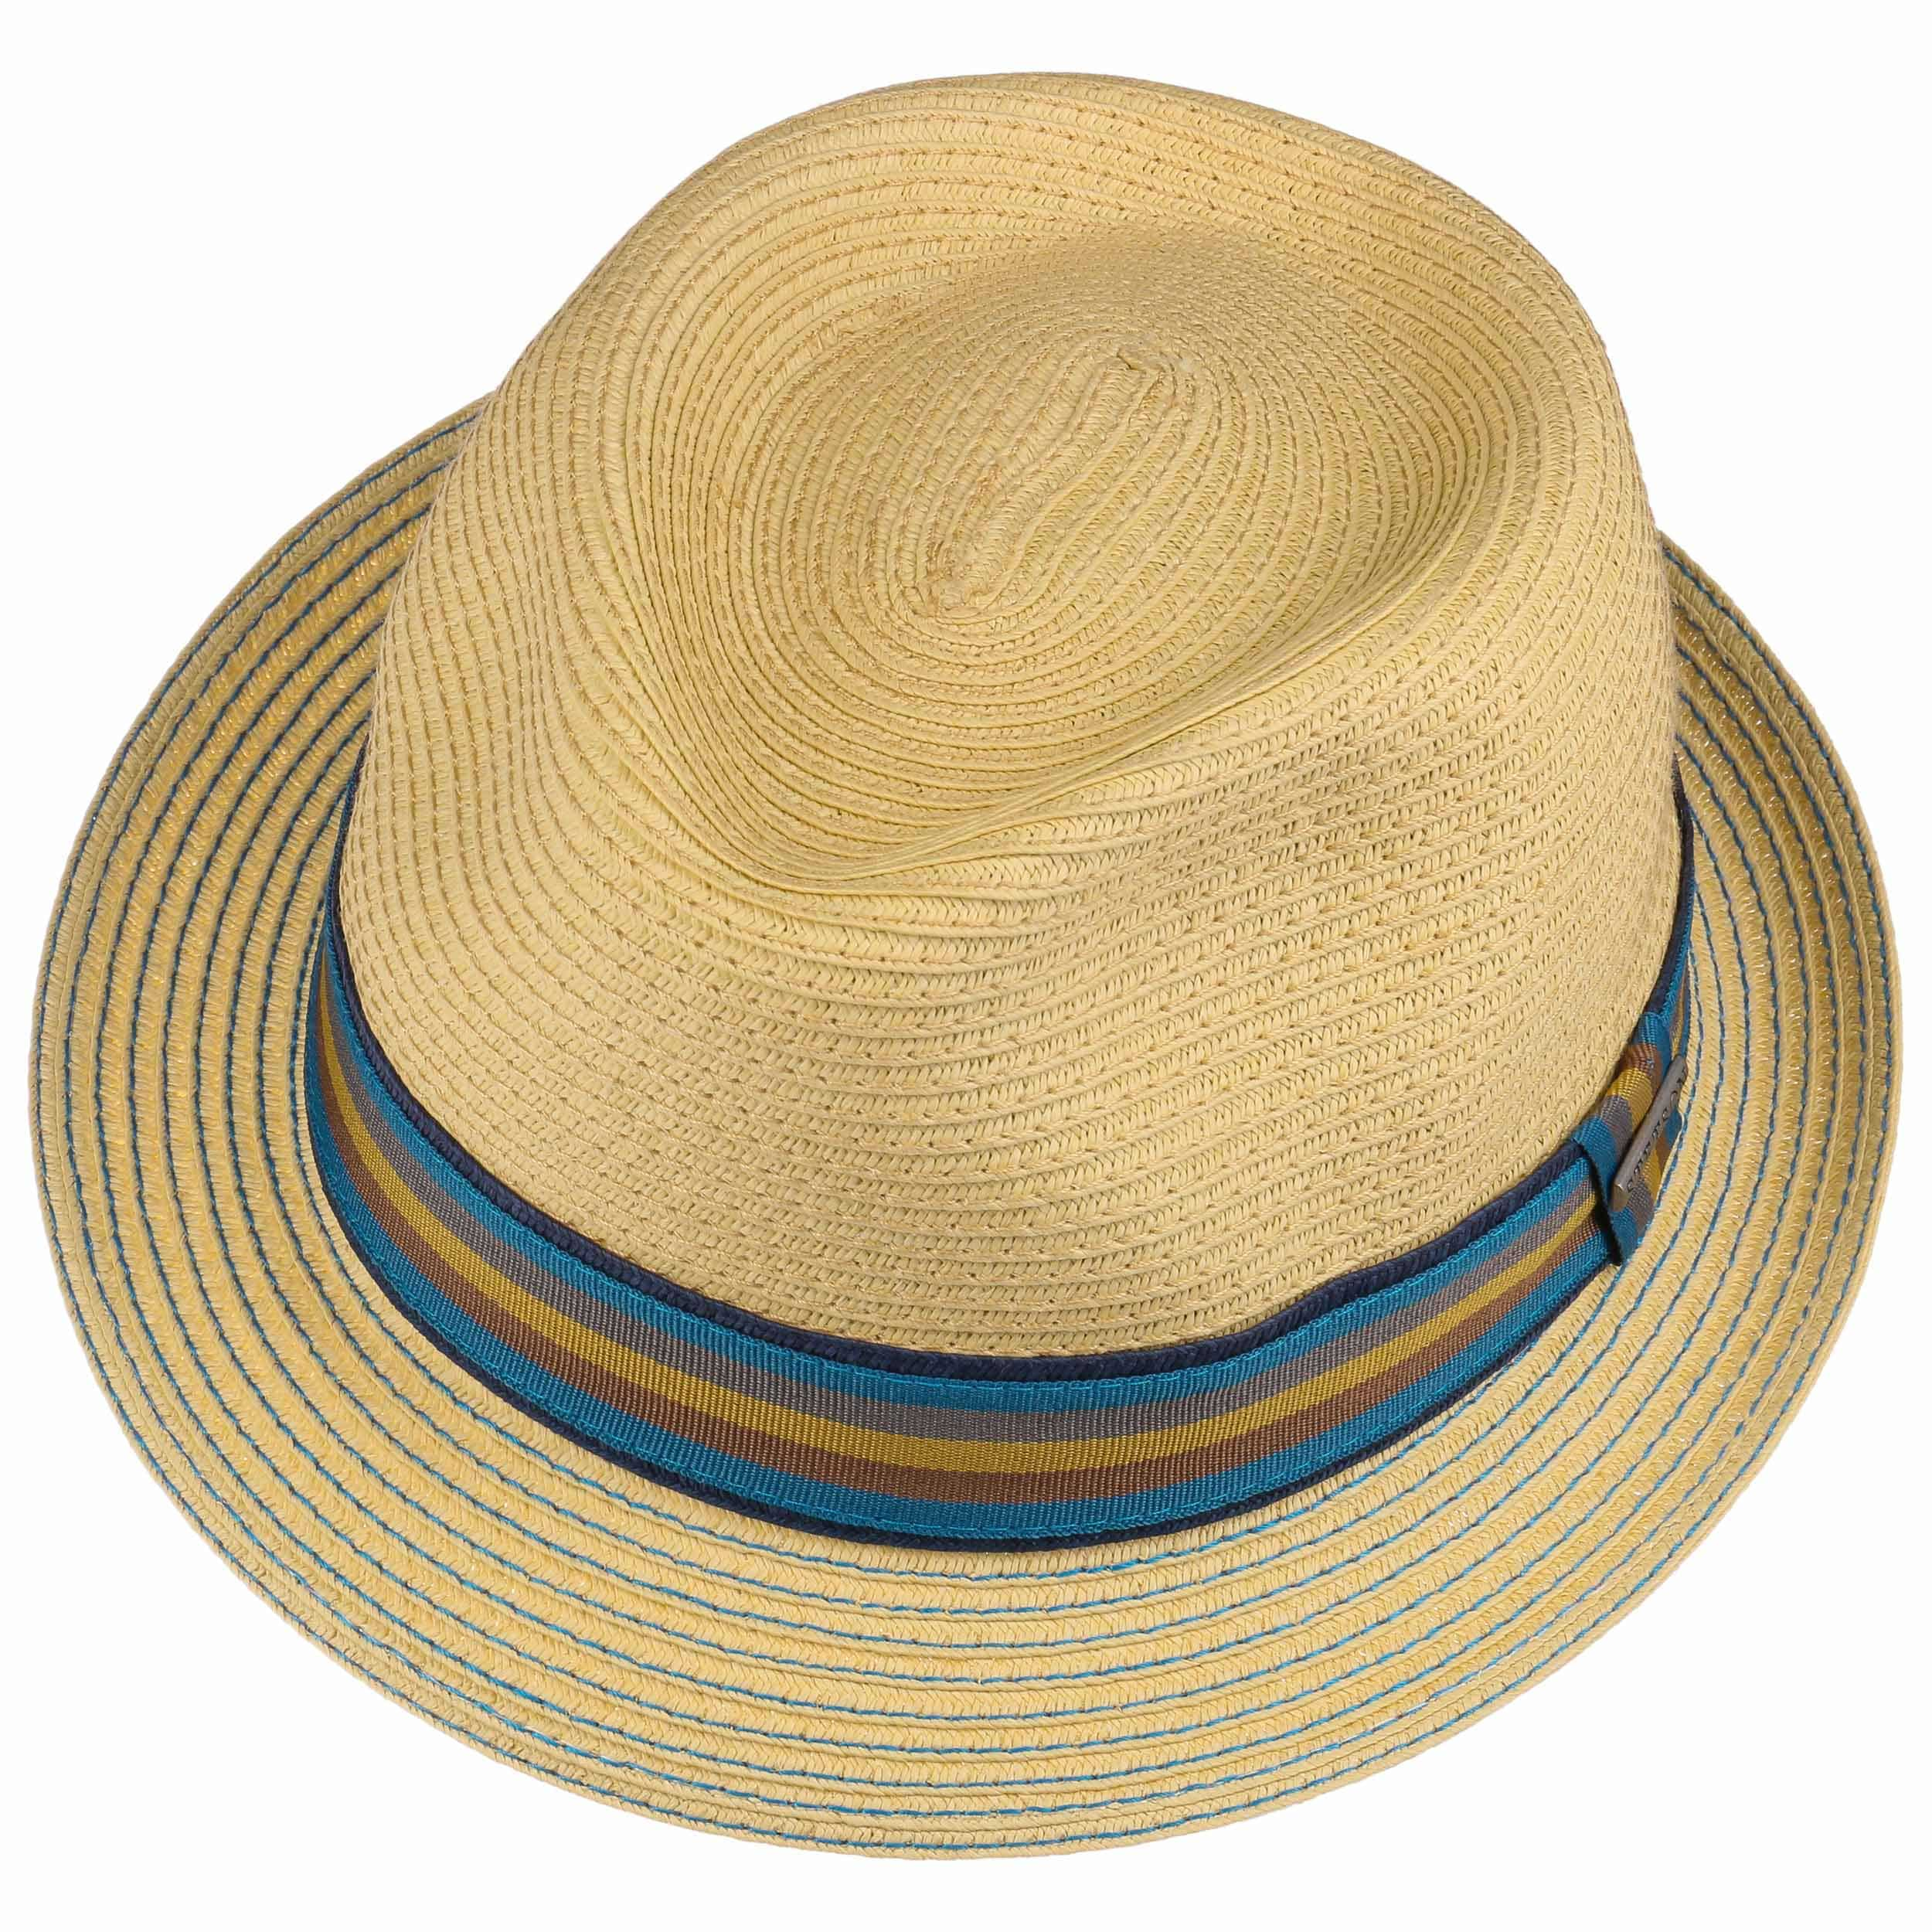 b8d6a676 ... Munster Toyo Trilby Hat by Stetson - bordeaux 2 ...